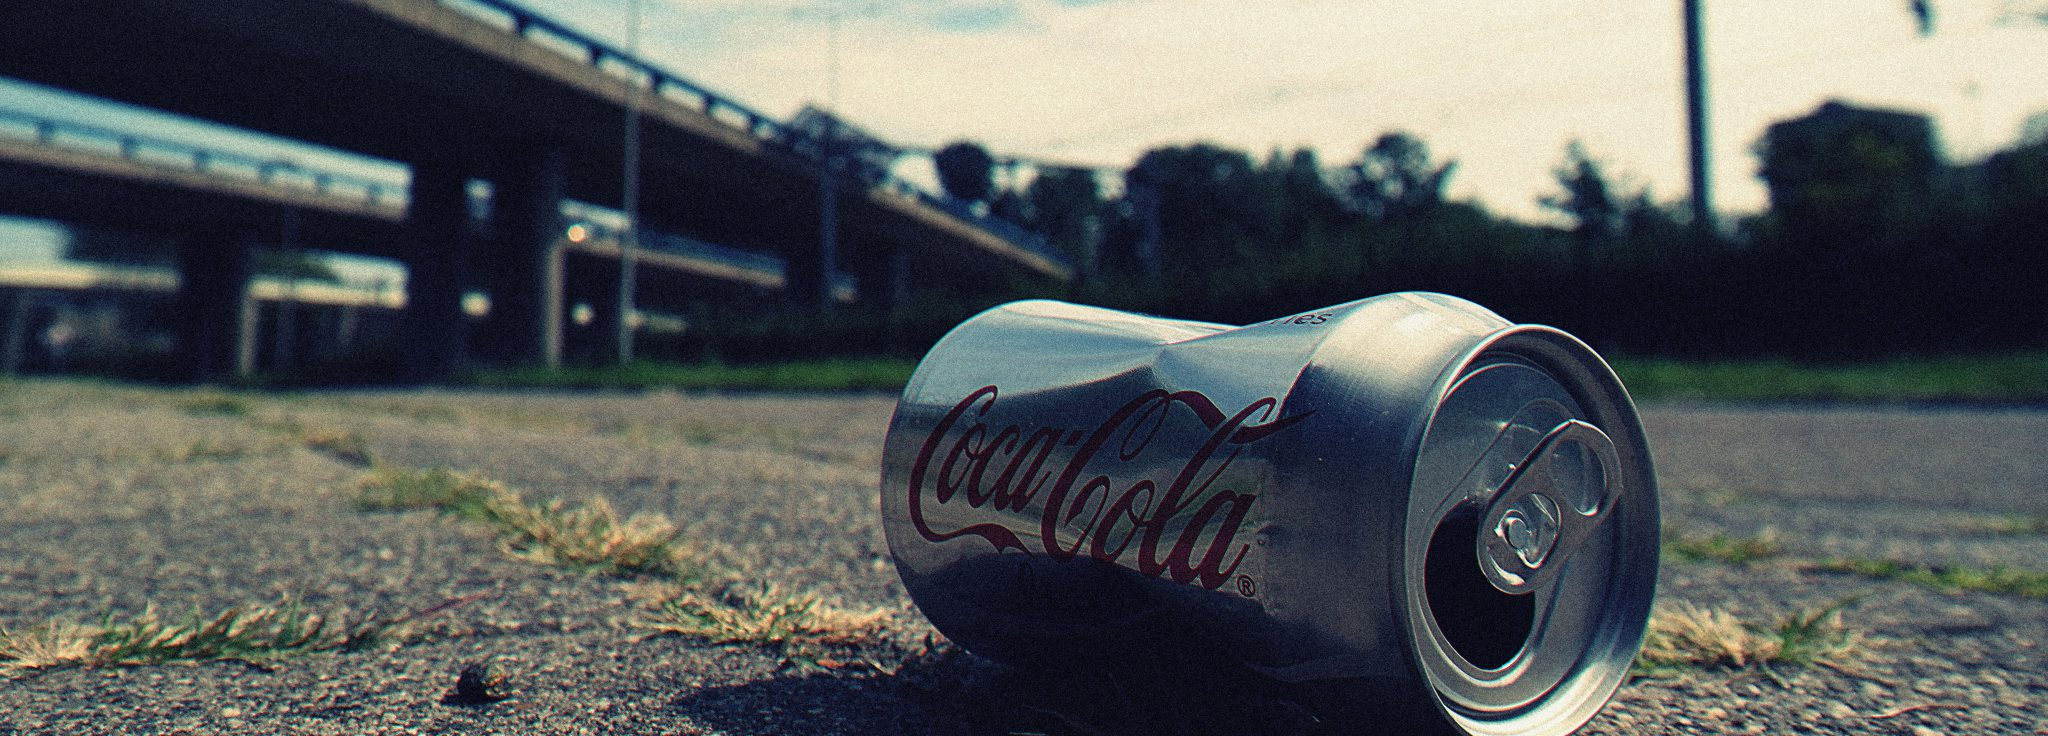 asphalt-automobile-can-117146